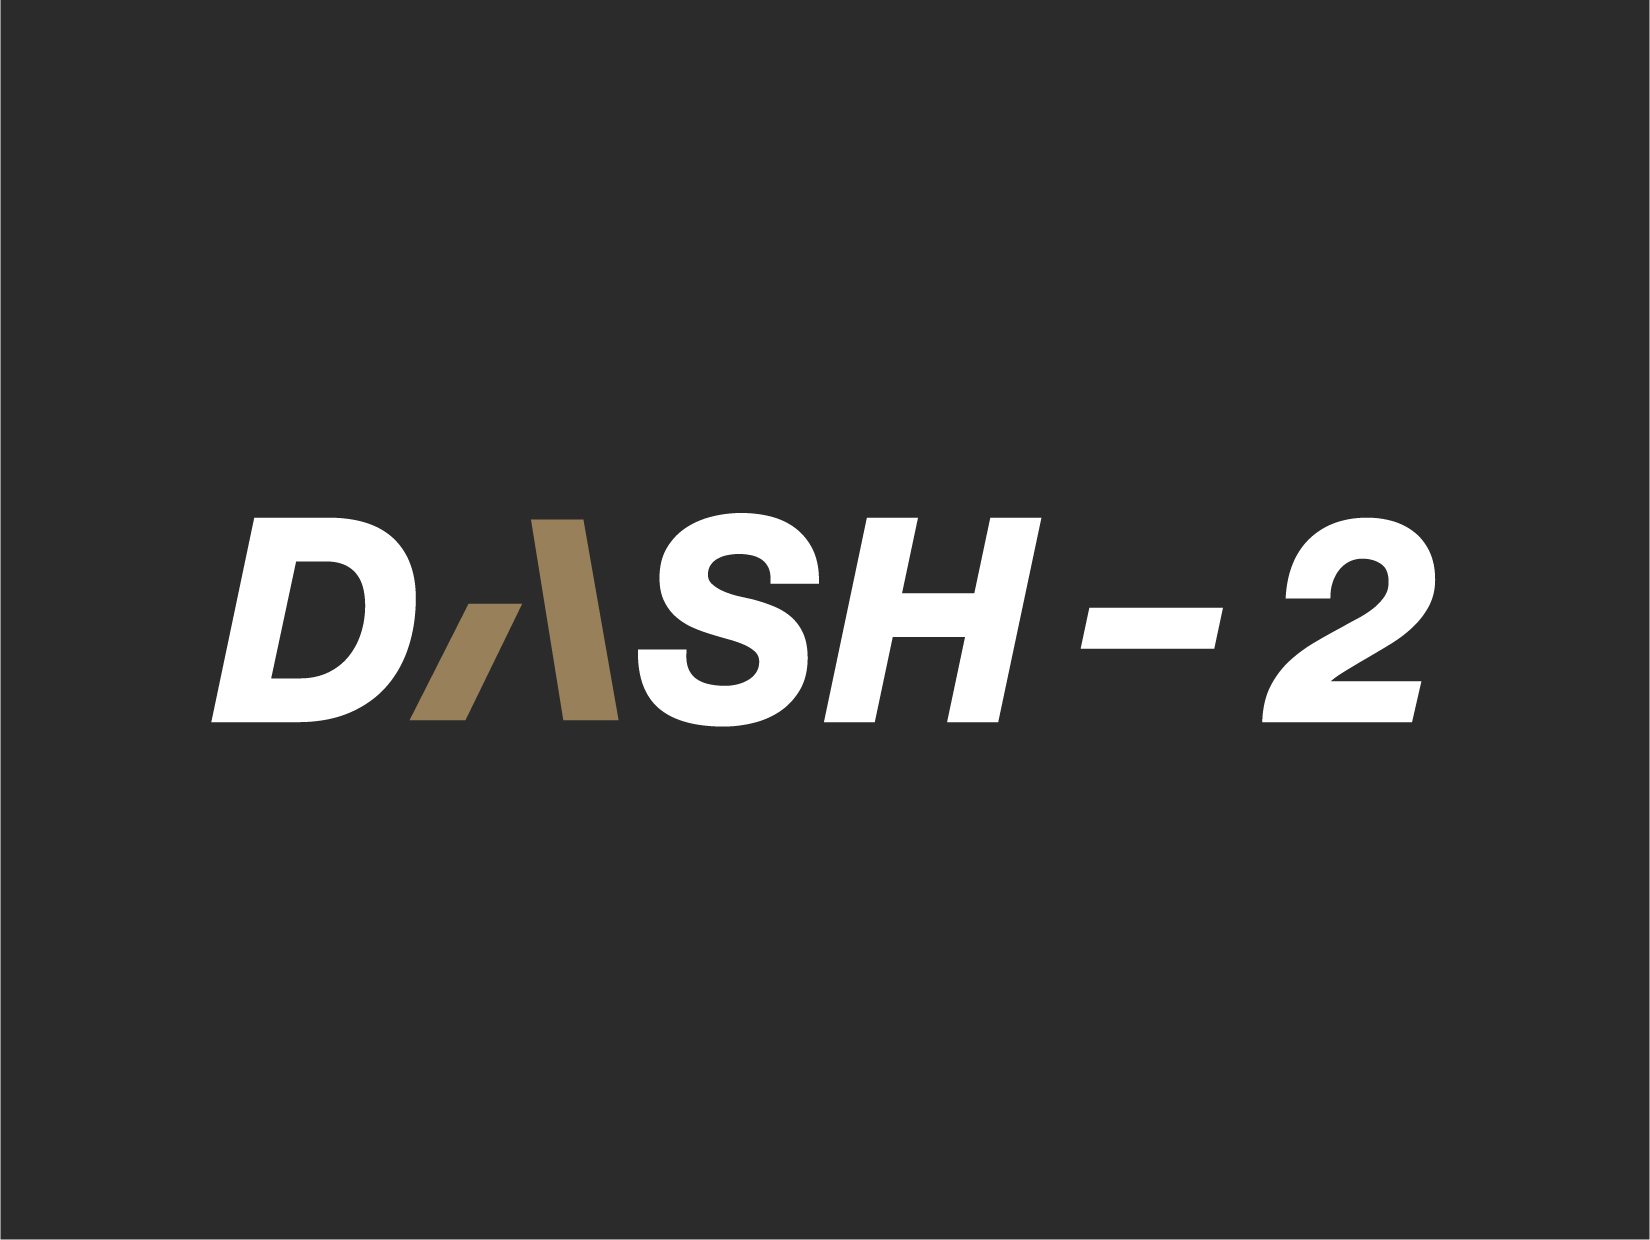 Dash 2 COO Event Image